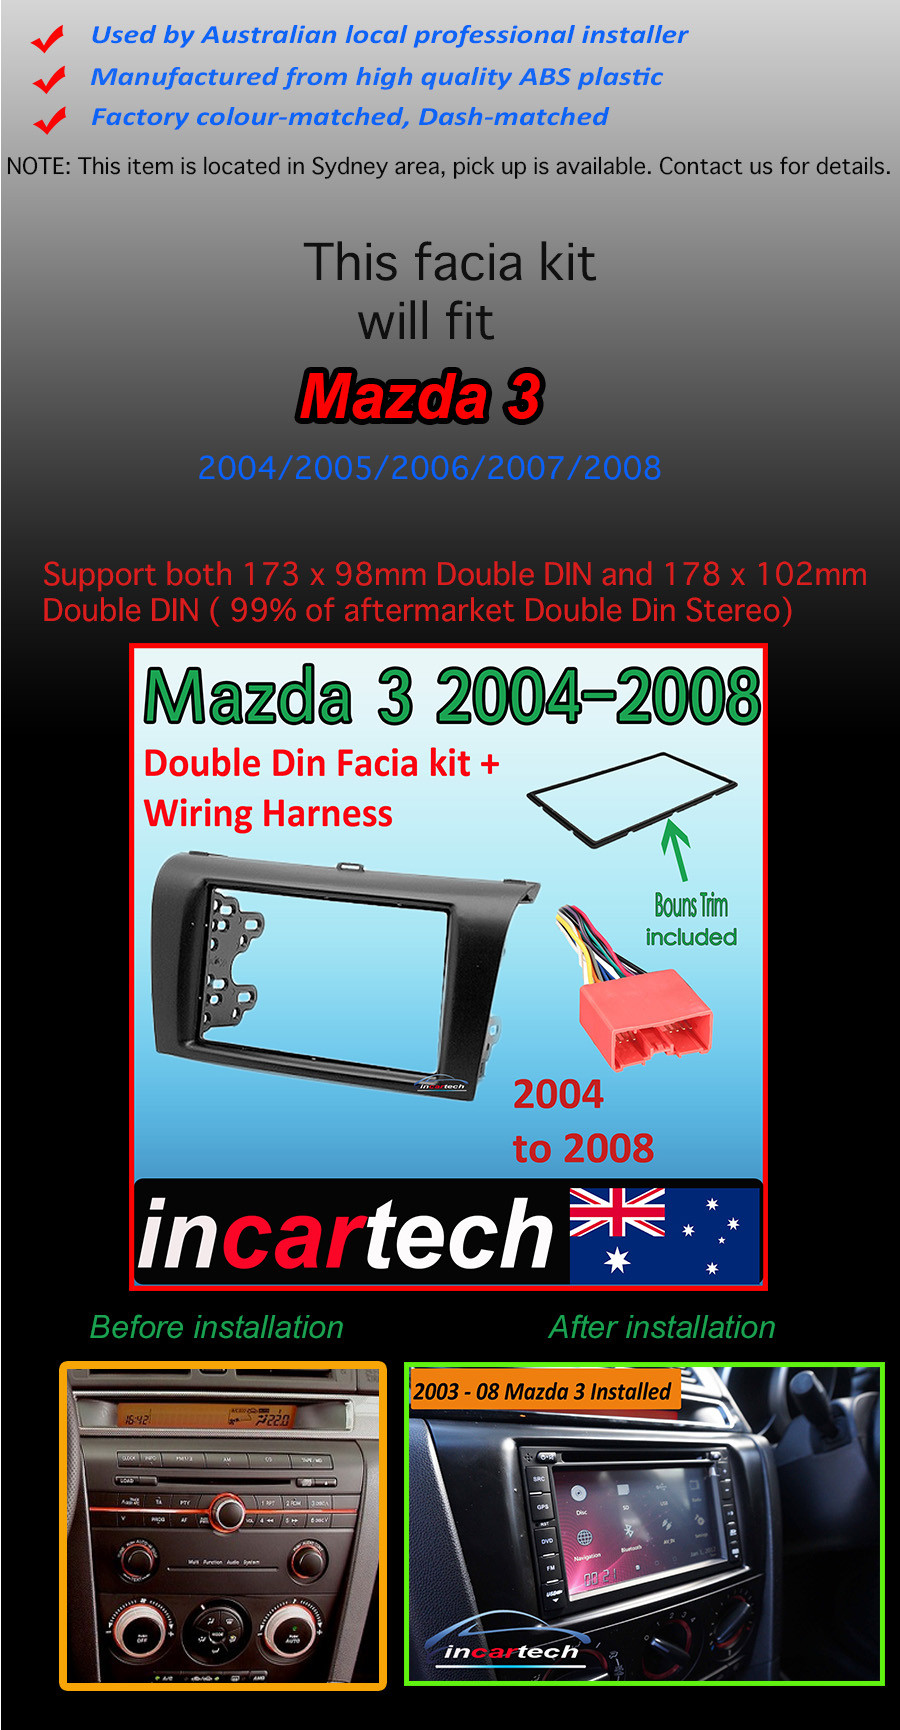 Mazda 3 Bk 2004 09 Facia Kit Fascia Panel Dash Trim Double Din Wiring Harness Categories